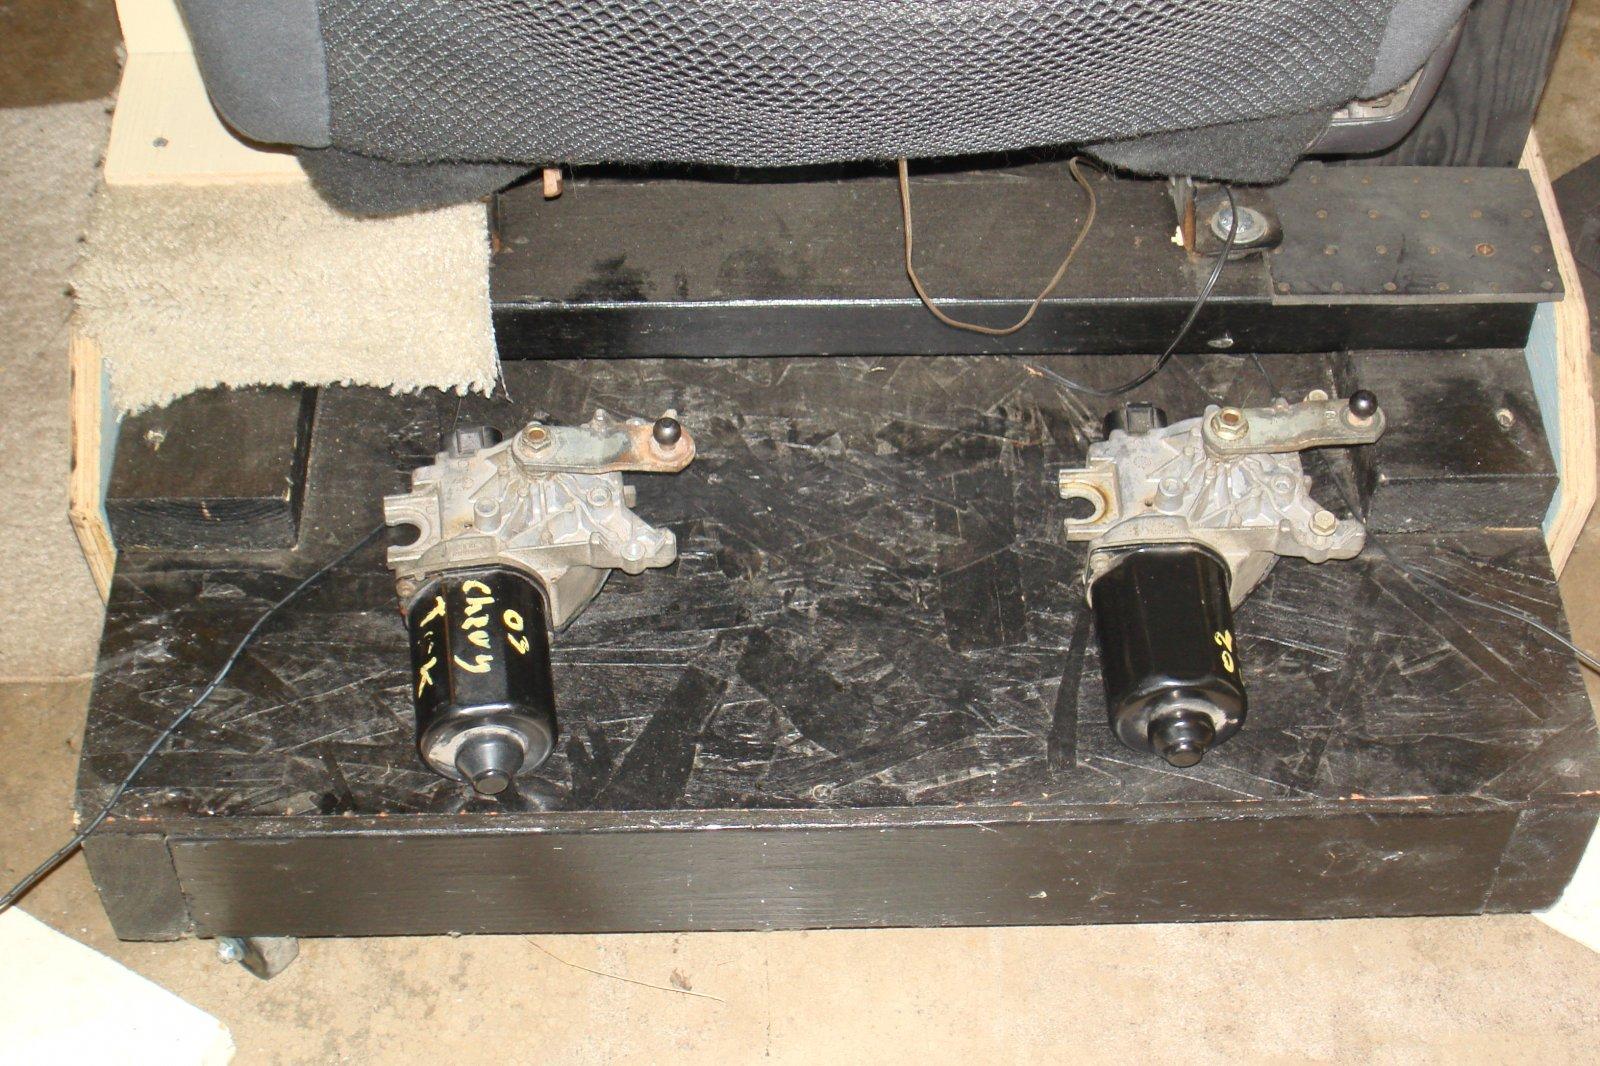 truck wiper motors.JPG